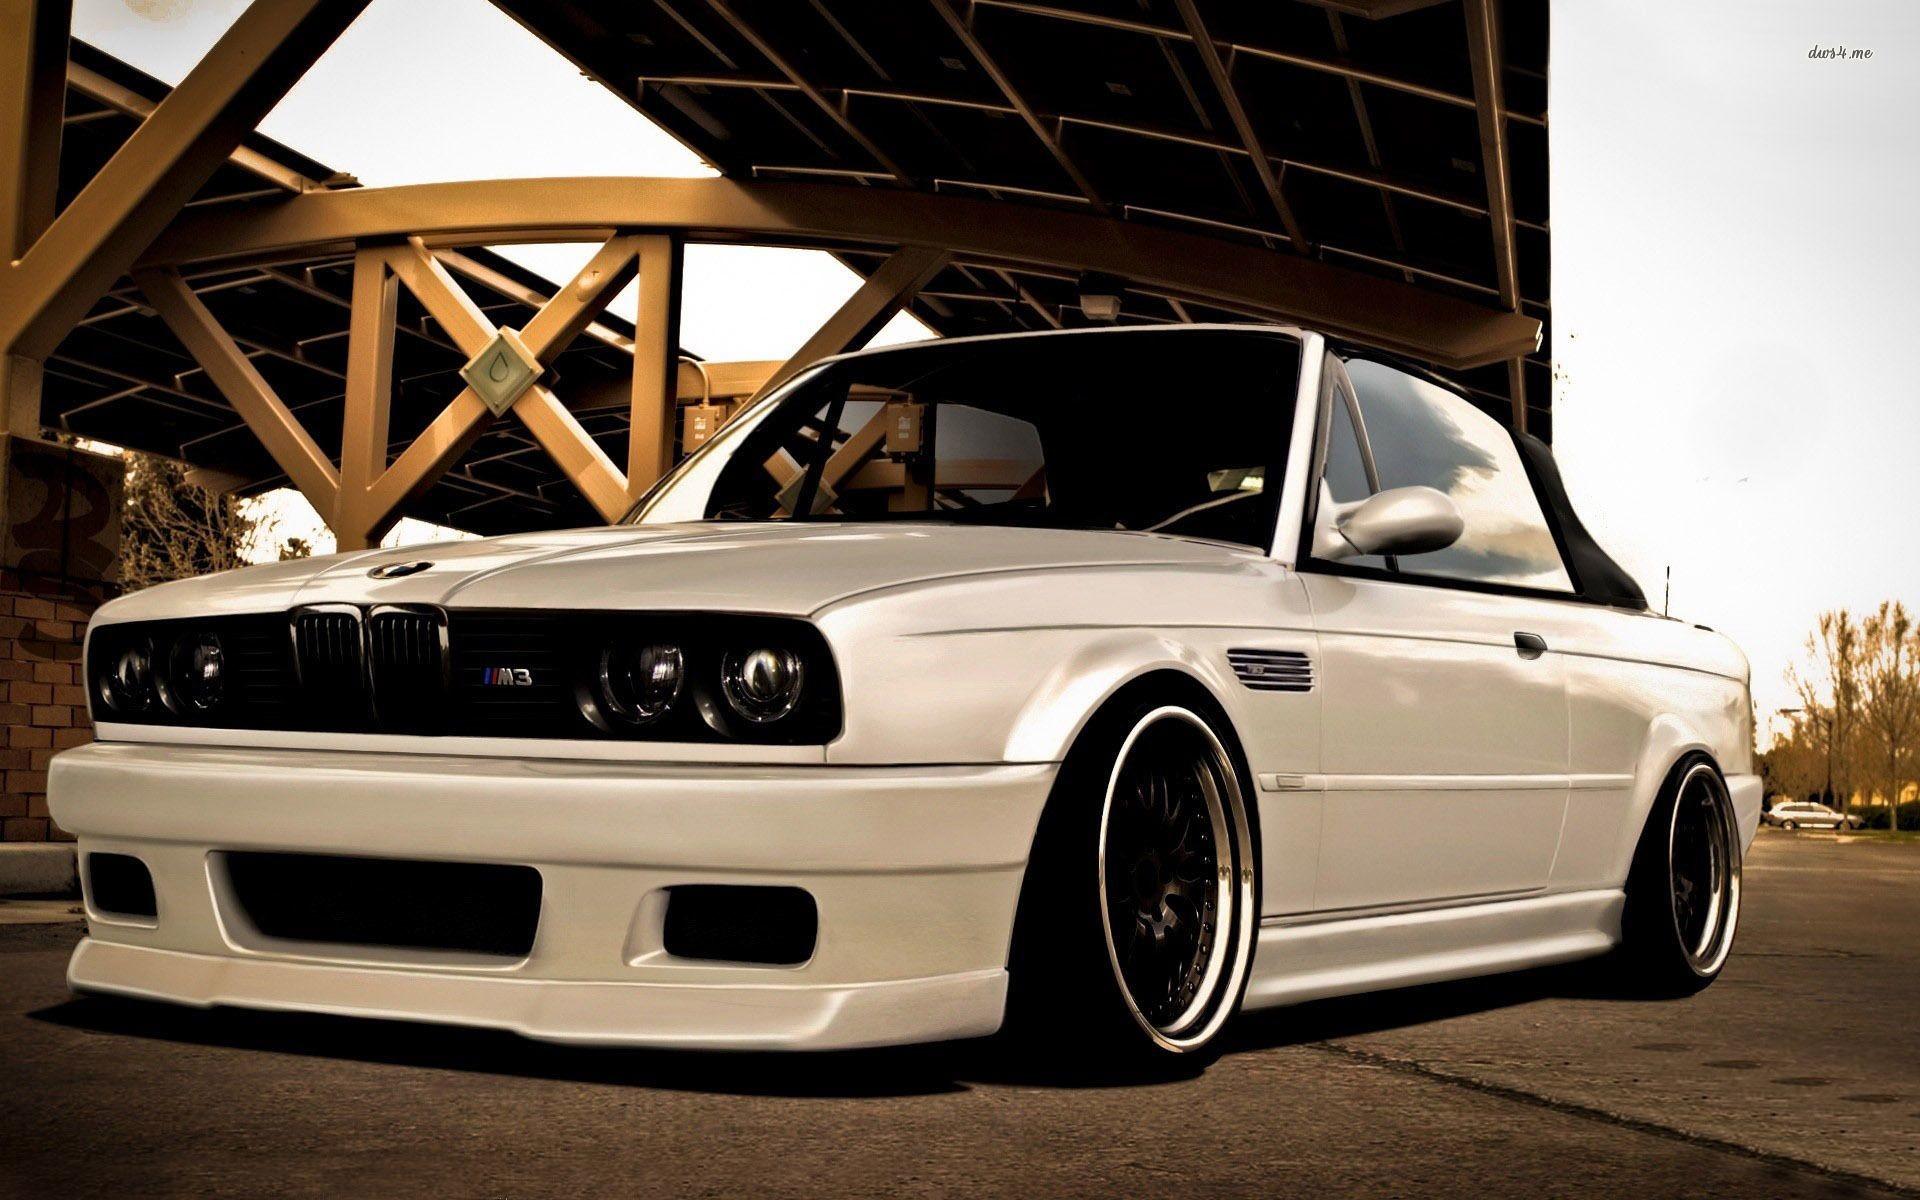 Res: 1920x1200, BMW M3 wallpaper - Car wallpapers - #15535